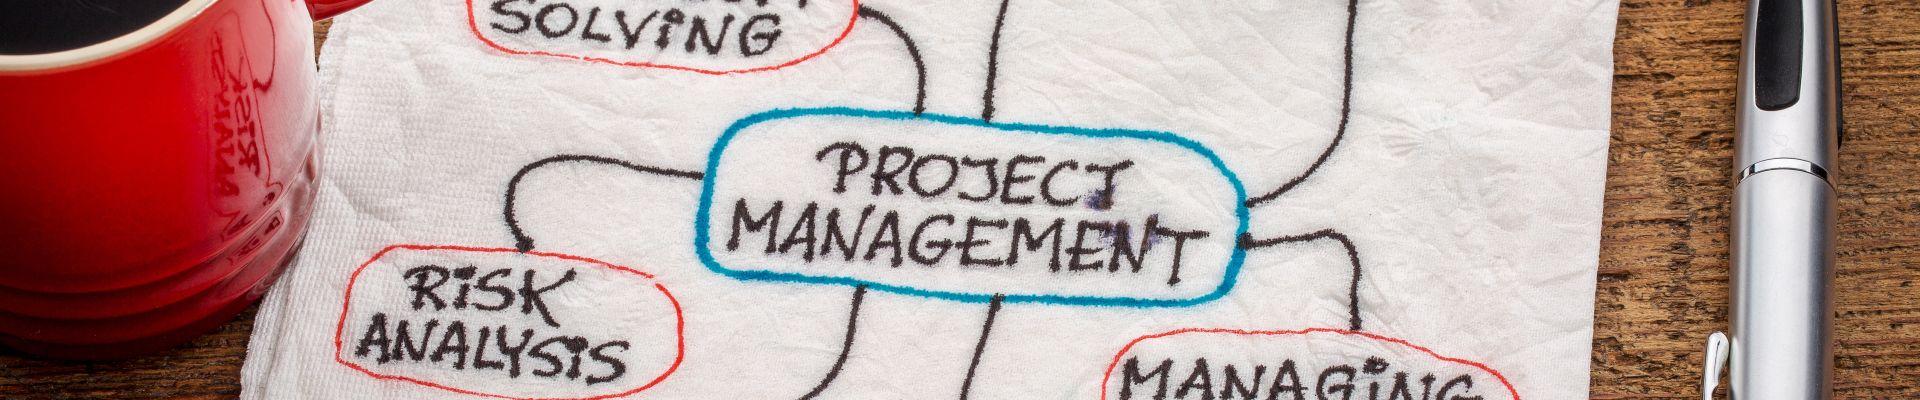 Banner-Project-Management